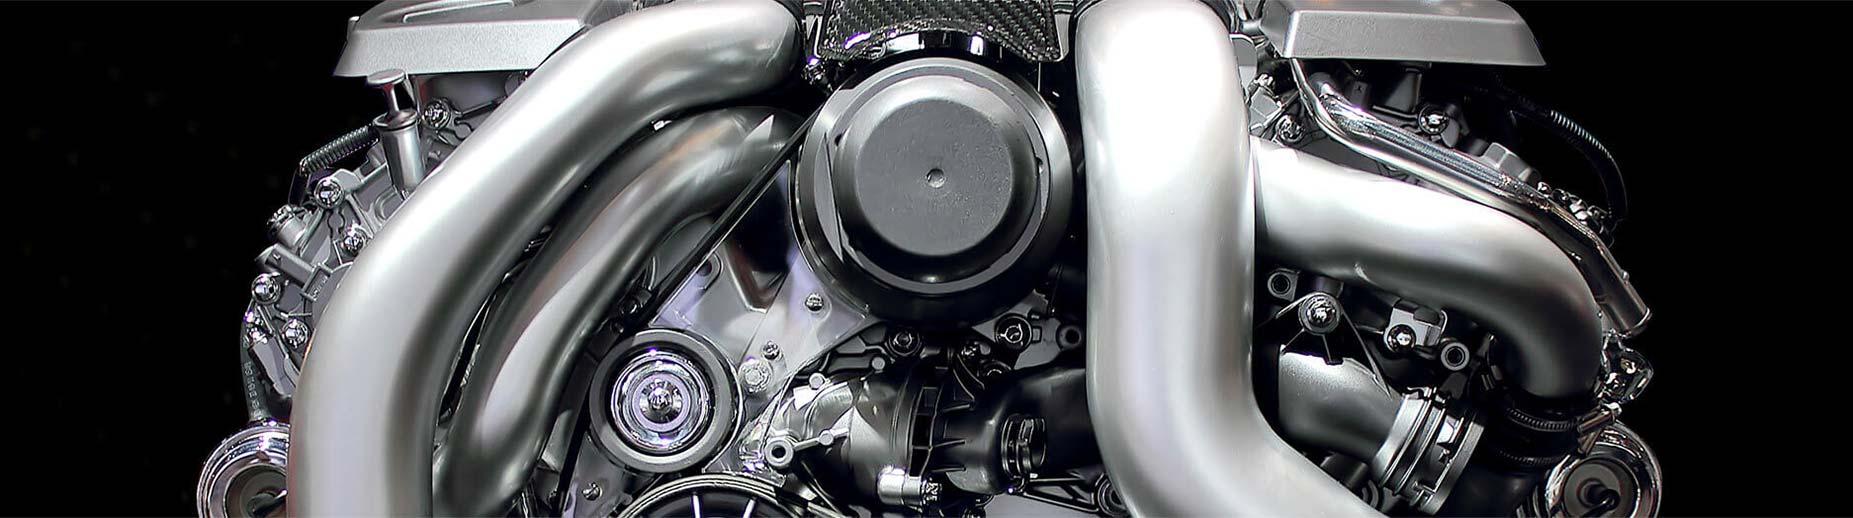 Lake Park Auto Repair, Auto Mechanic and Auto Body Shop